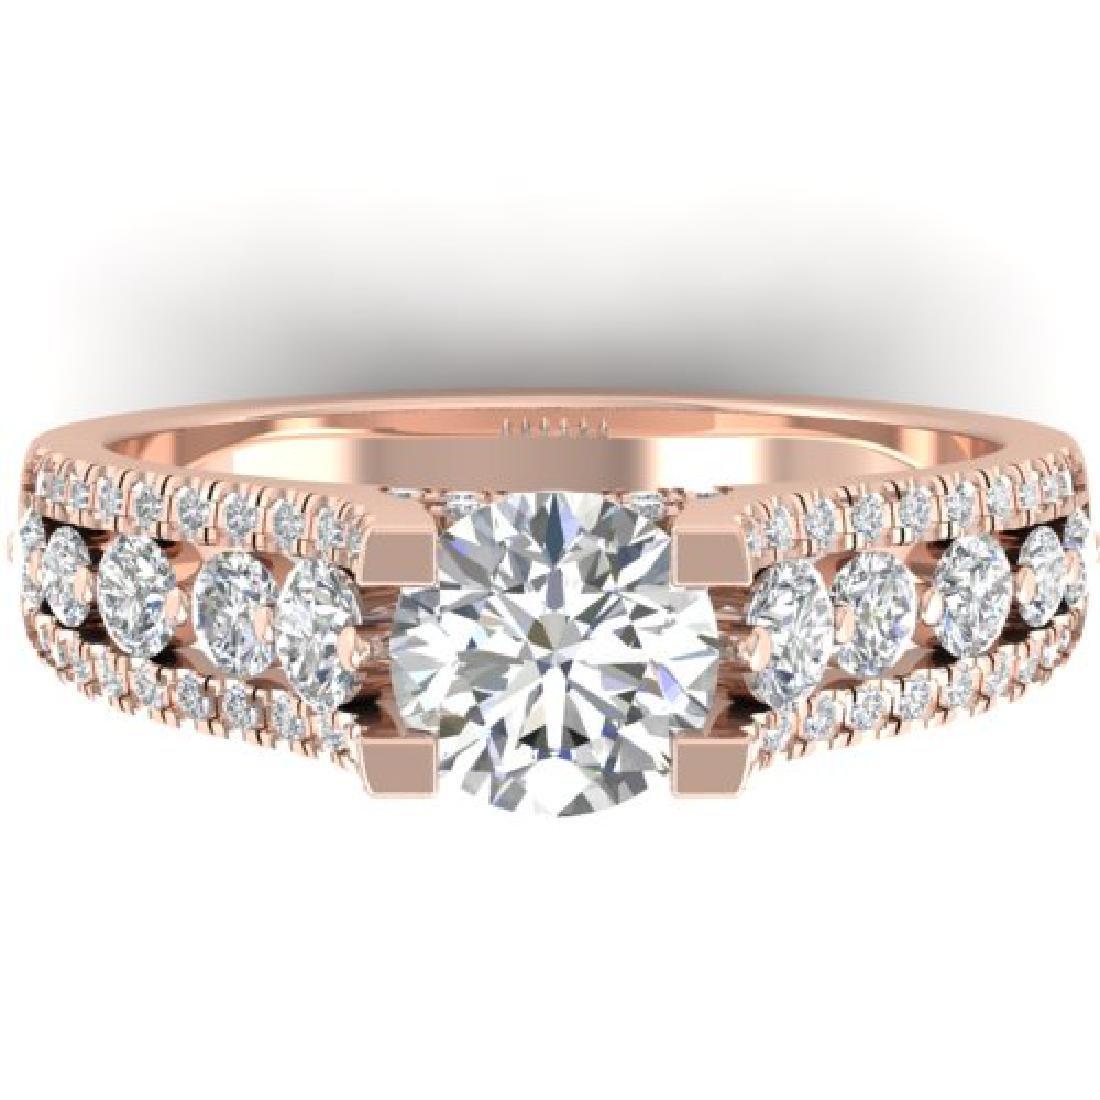 2.55 CTW Certified VS/SI Diamond Art Deco Micro Ring